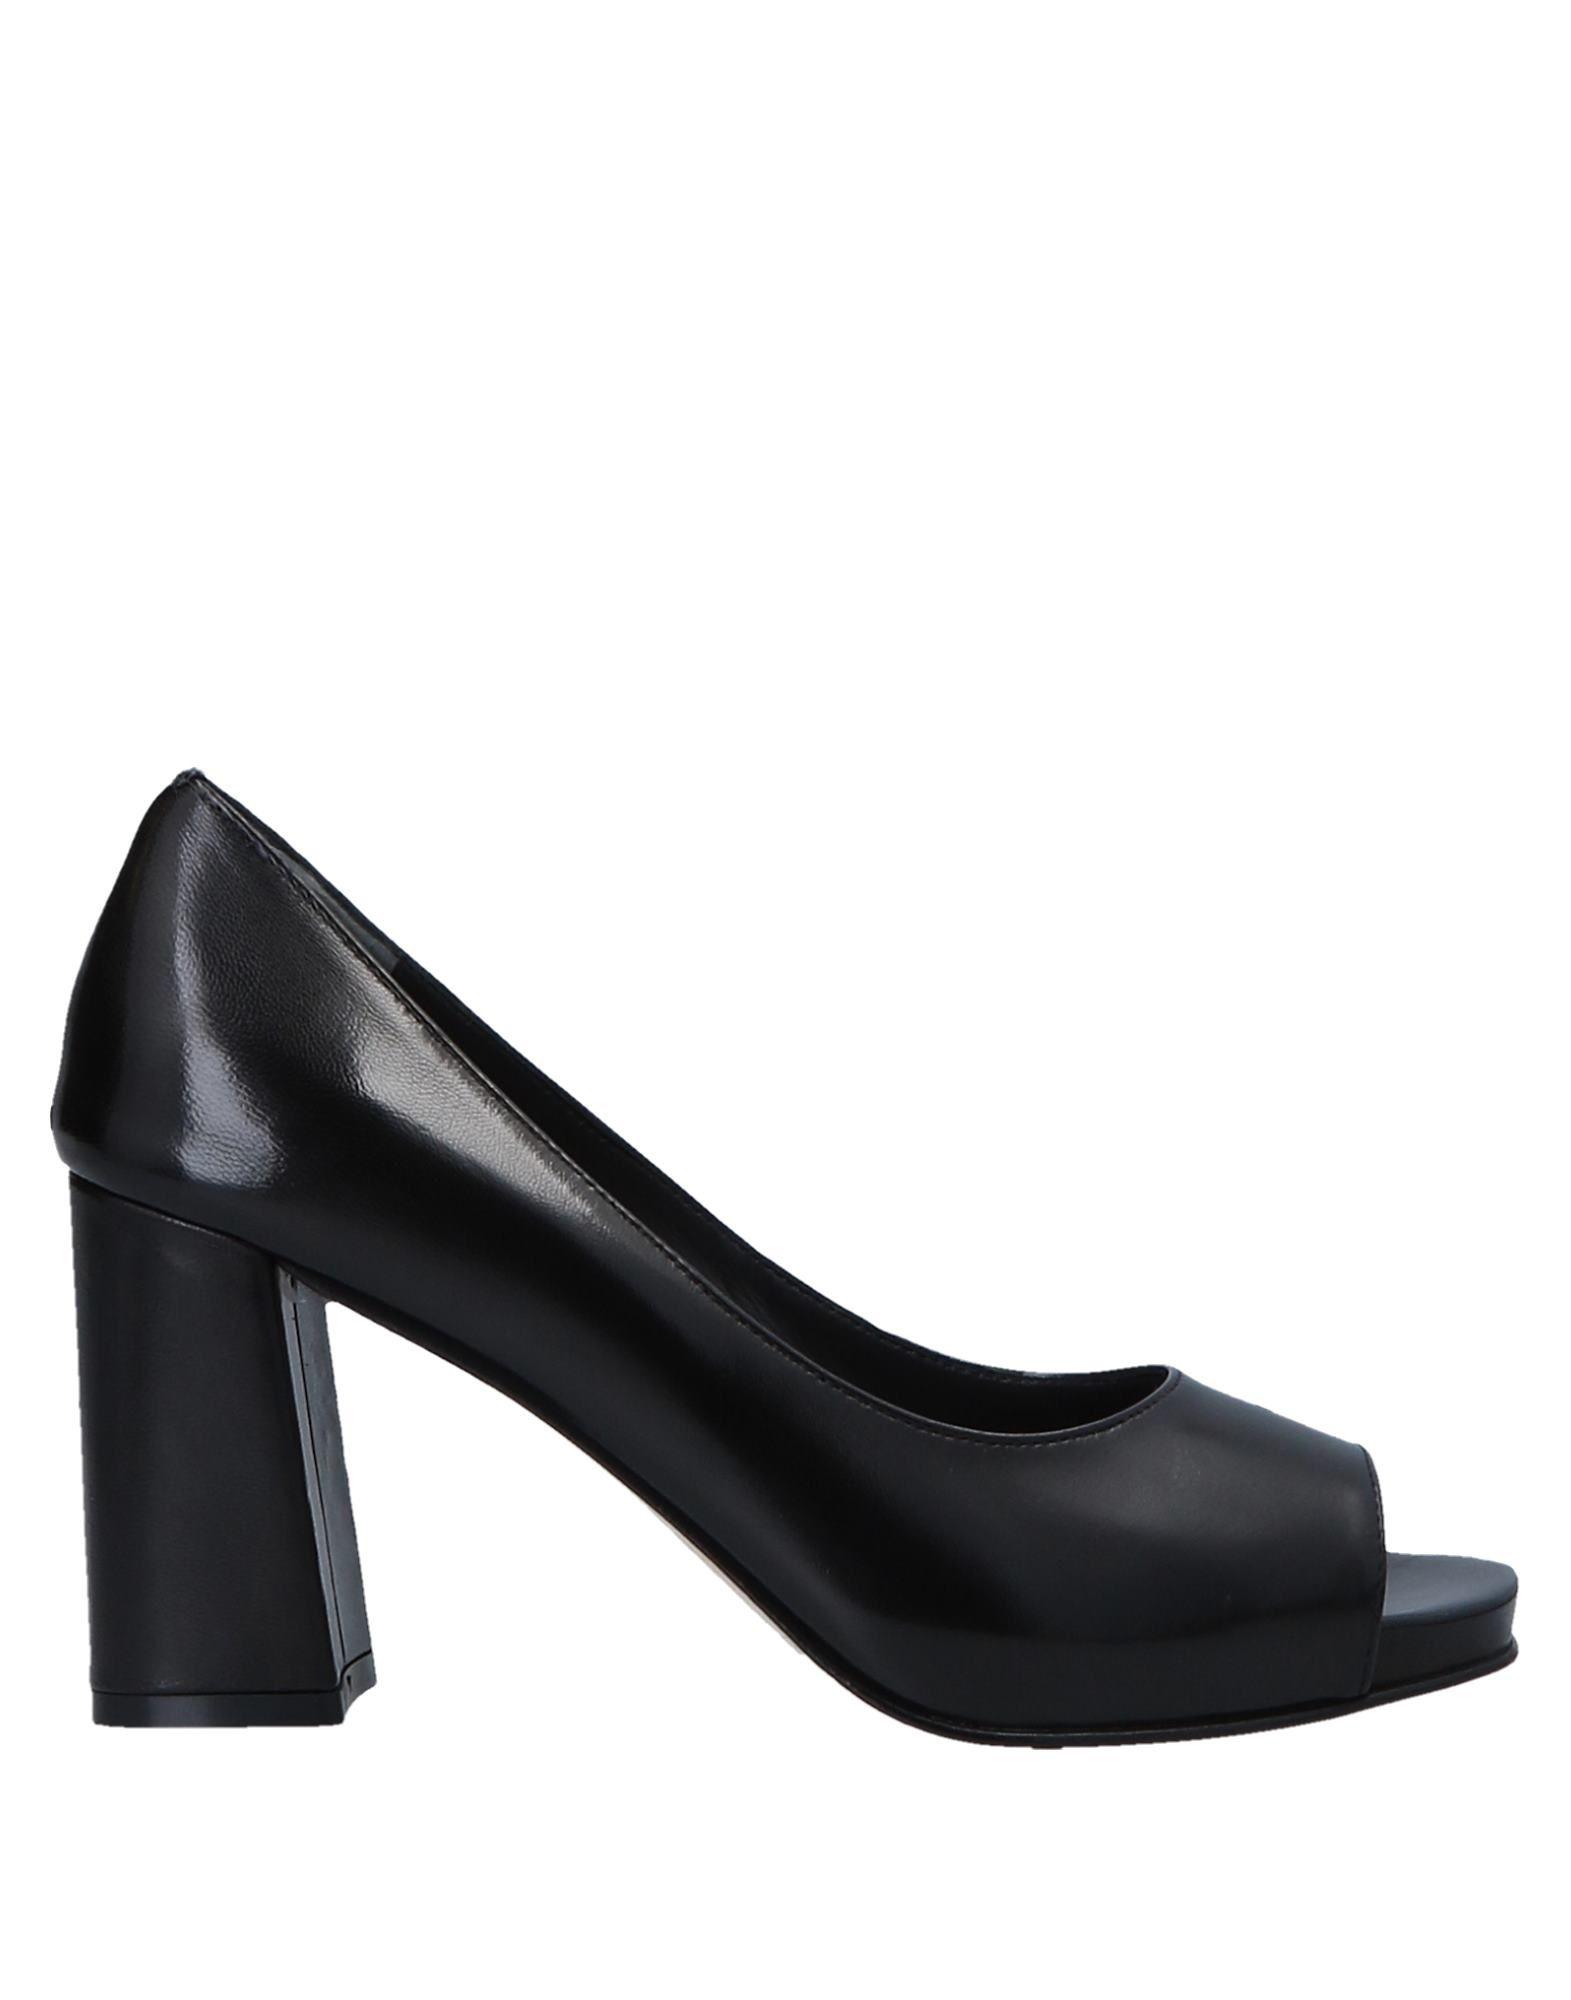 Calpierre Pumps Gute Damen  11552119PE Gute Pumps Qualität beliebte Schuhe 0af280